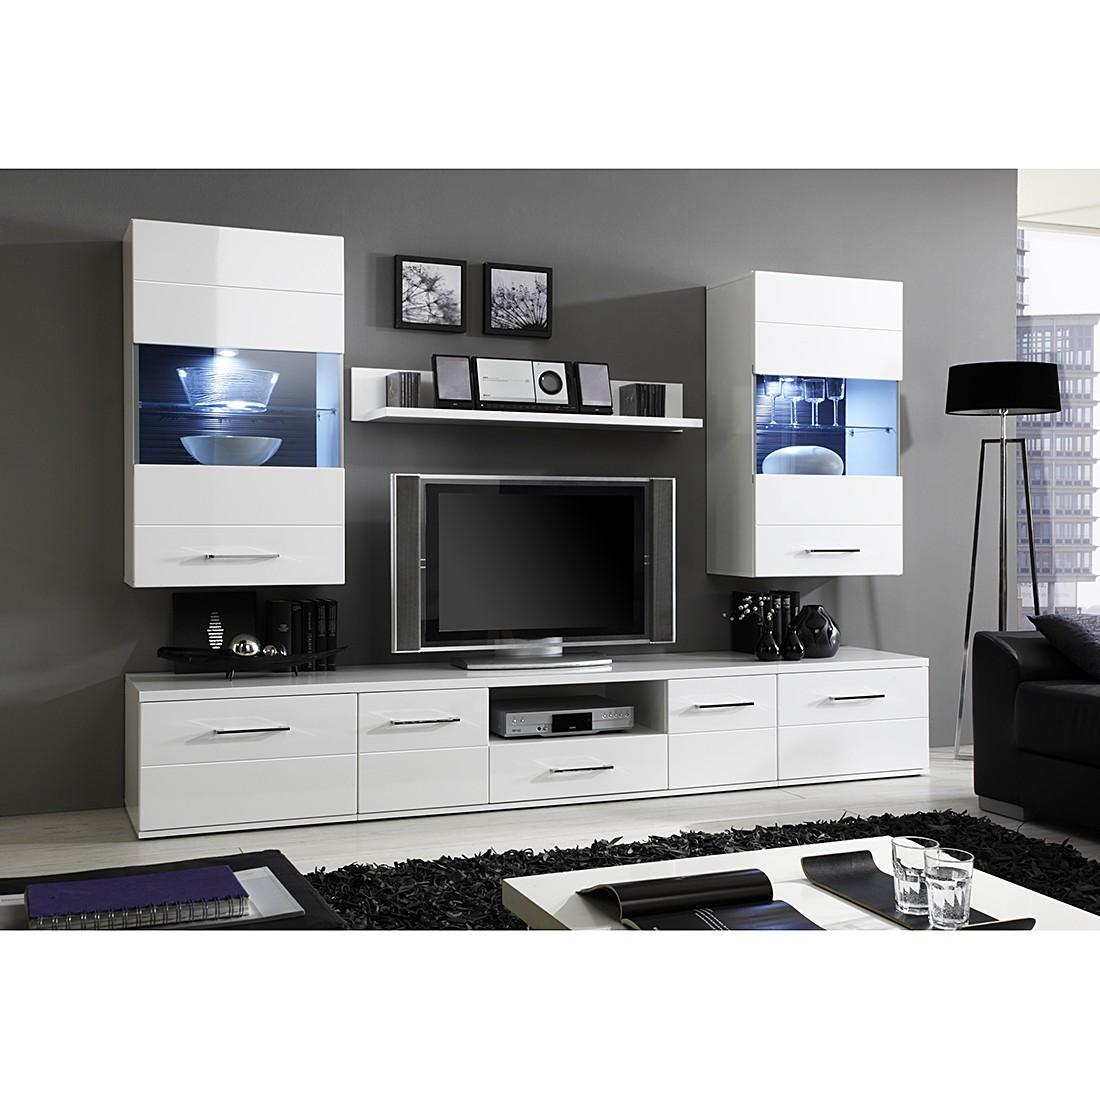 EEK A+, Wohnwand GlossyStar IV (6-teilig) – Hochglanz Weiß, Modoform günstig bestellen